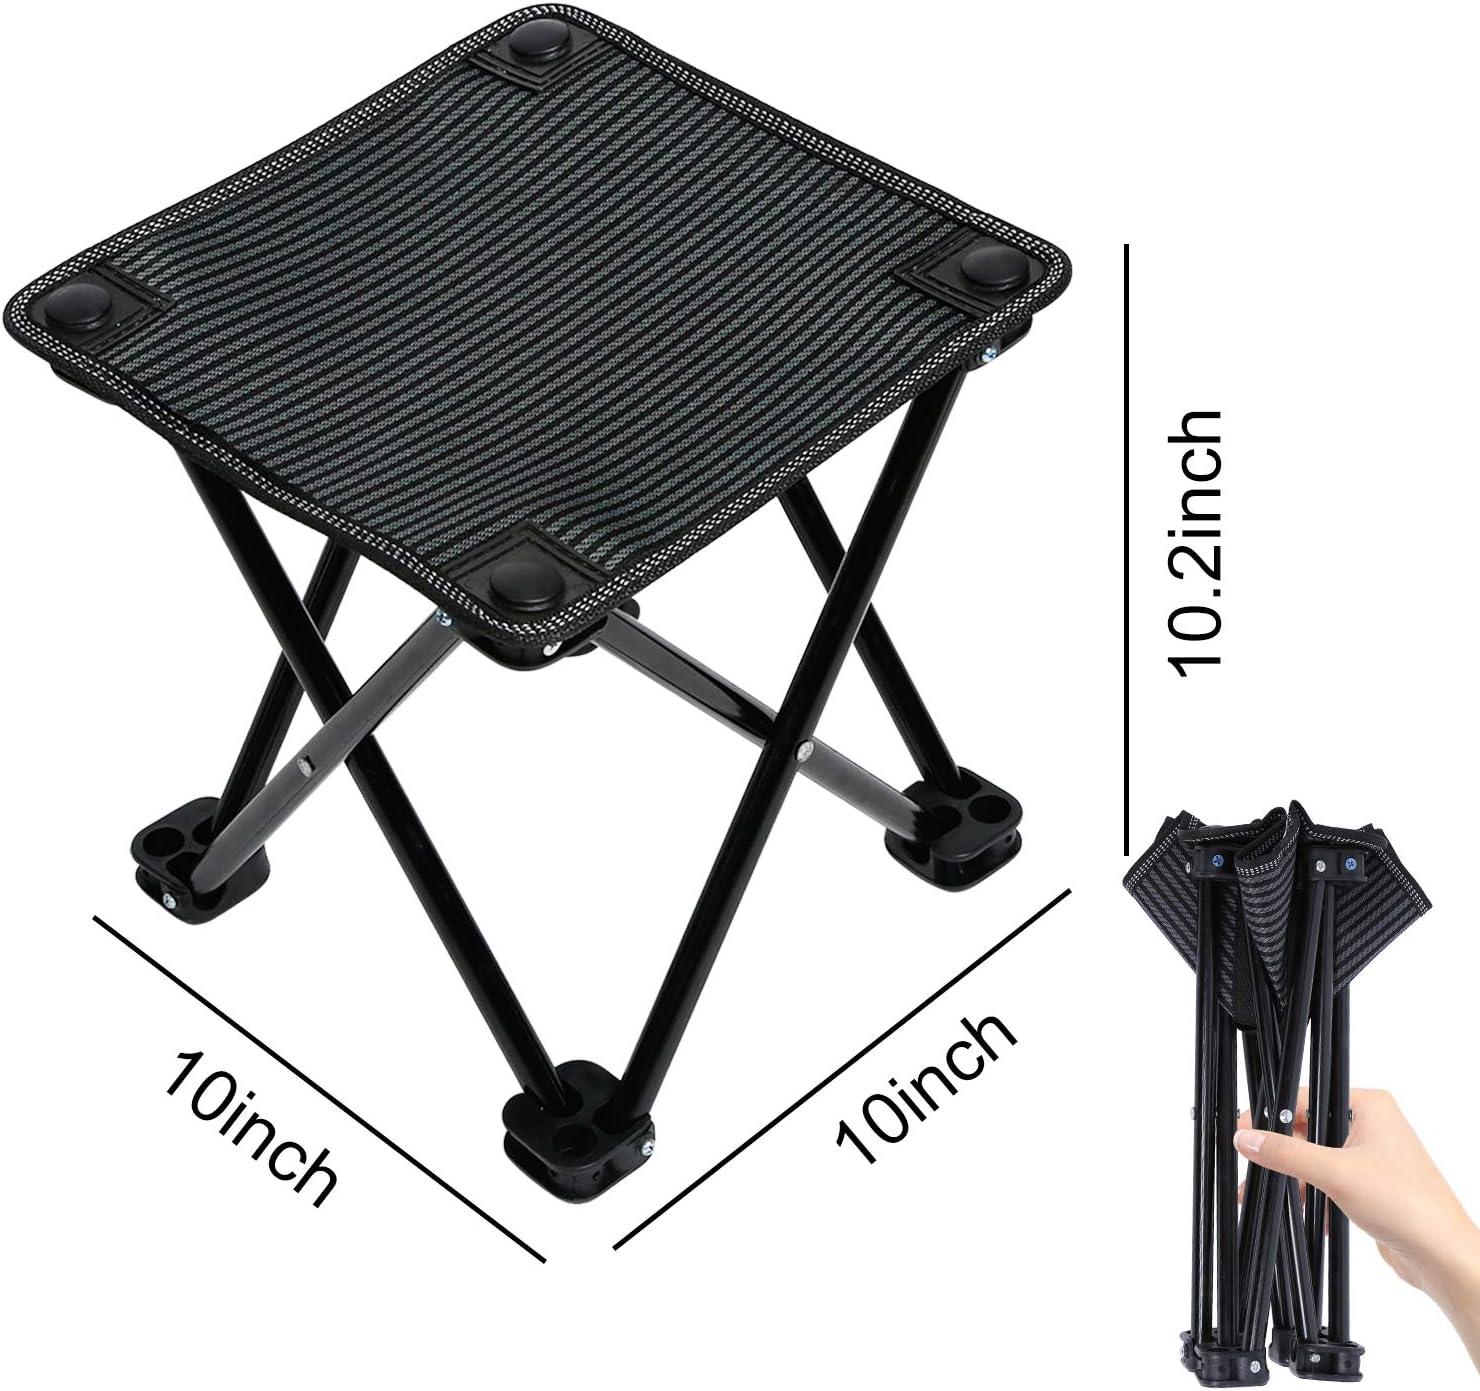 Gelma Mini Folding Camp Stool Portable Camping Chair Lightweight Ultralight Outdoor Folding Step Stool